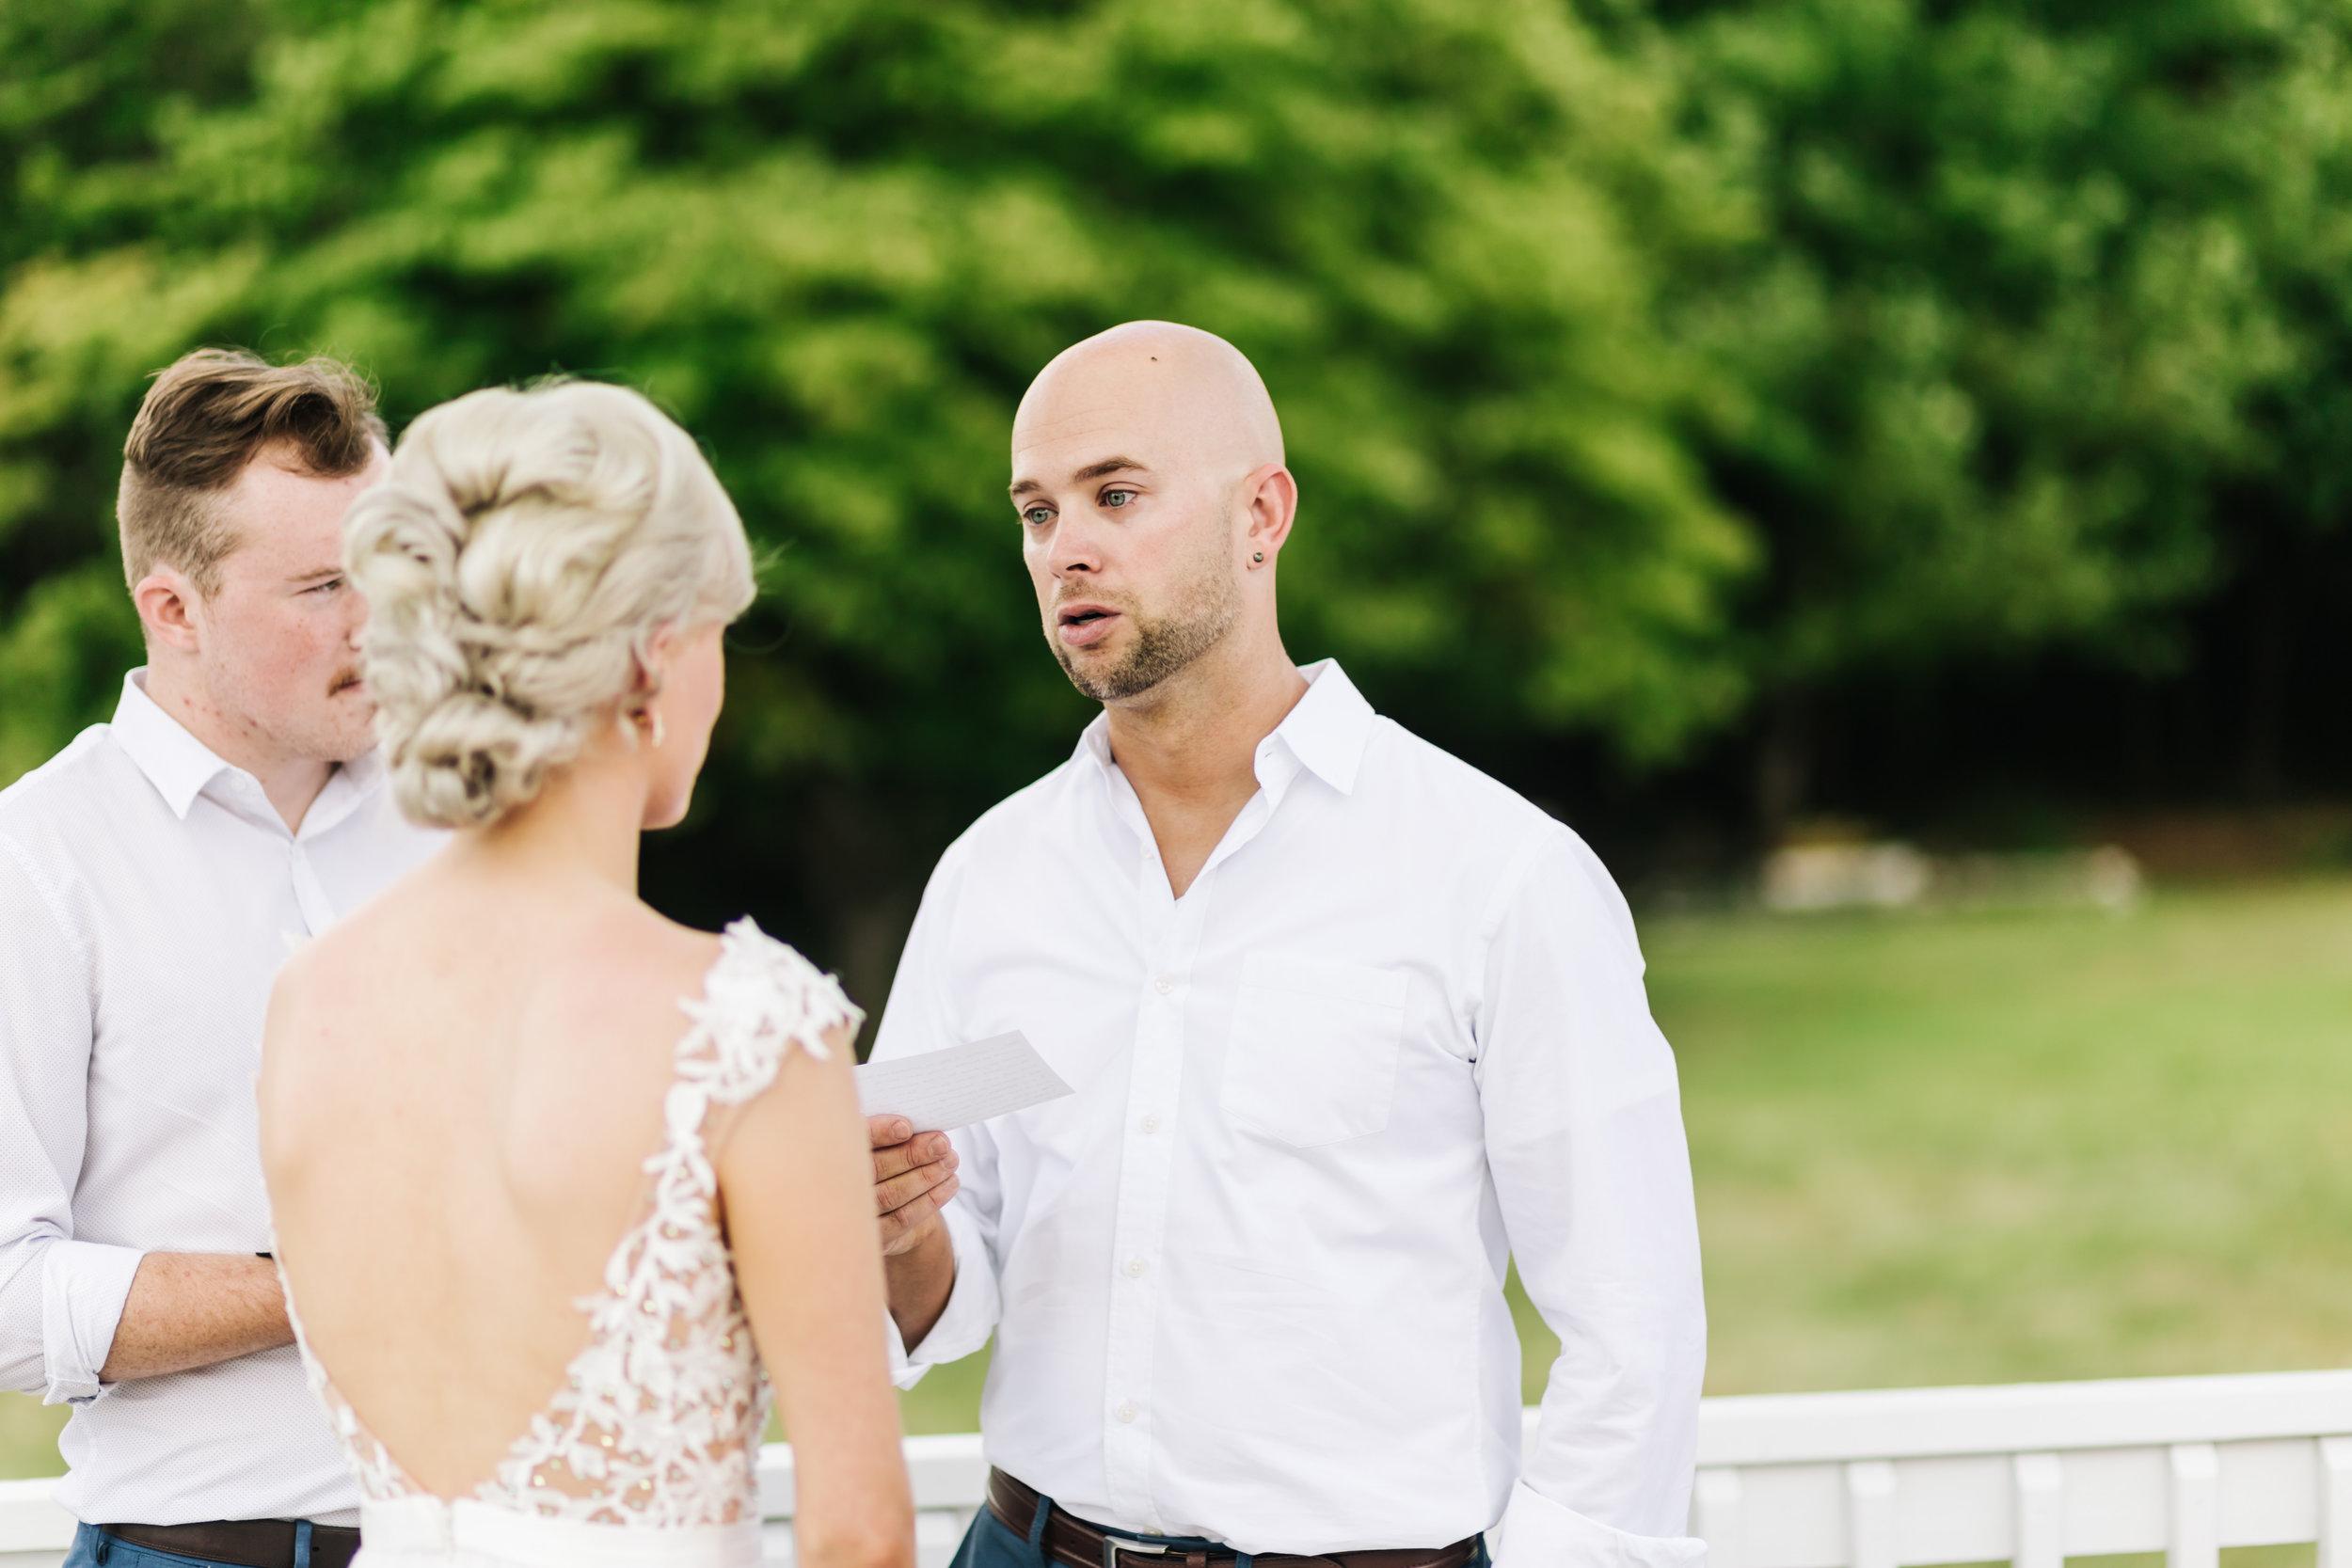 2018.09.02 Ray and Sarah Prizner Nashville TN Wedding FINALS-275.jpg